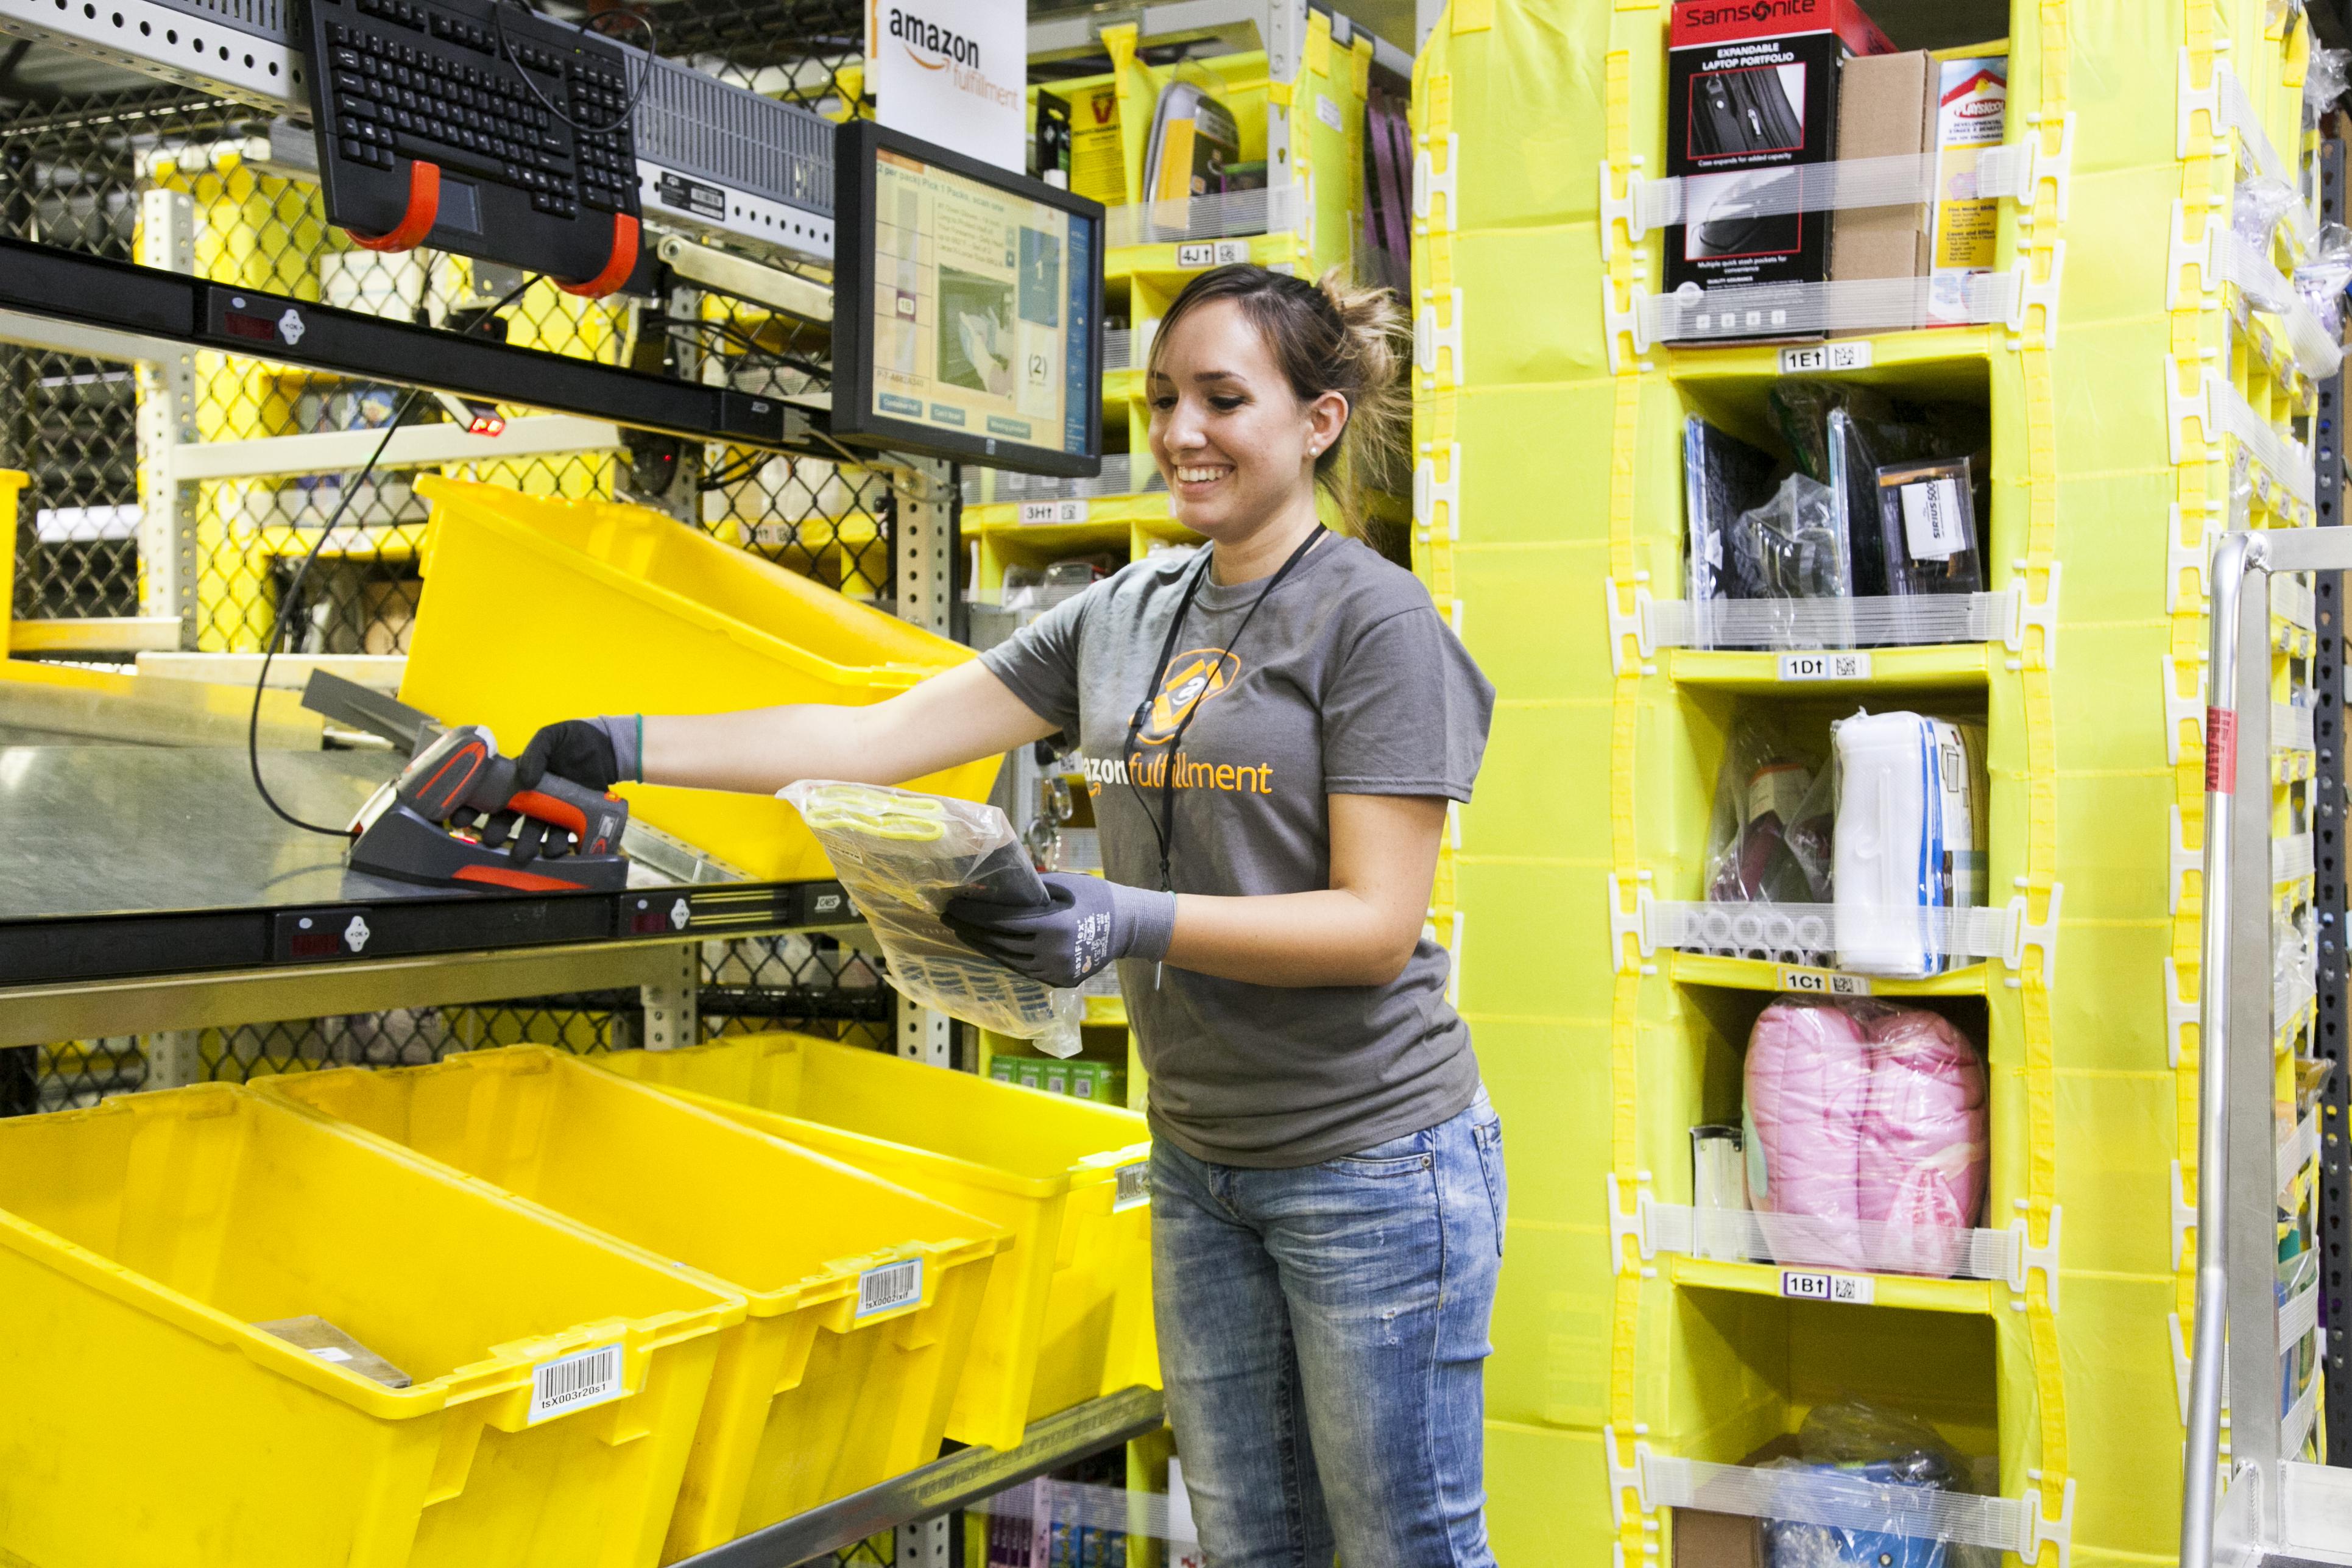 An Amazon fulfillment employee preparing goods for shipping.